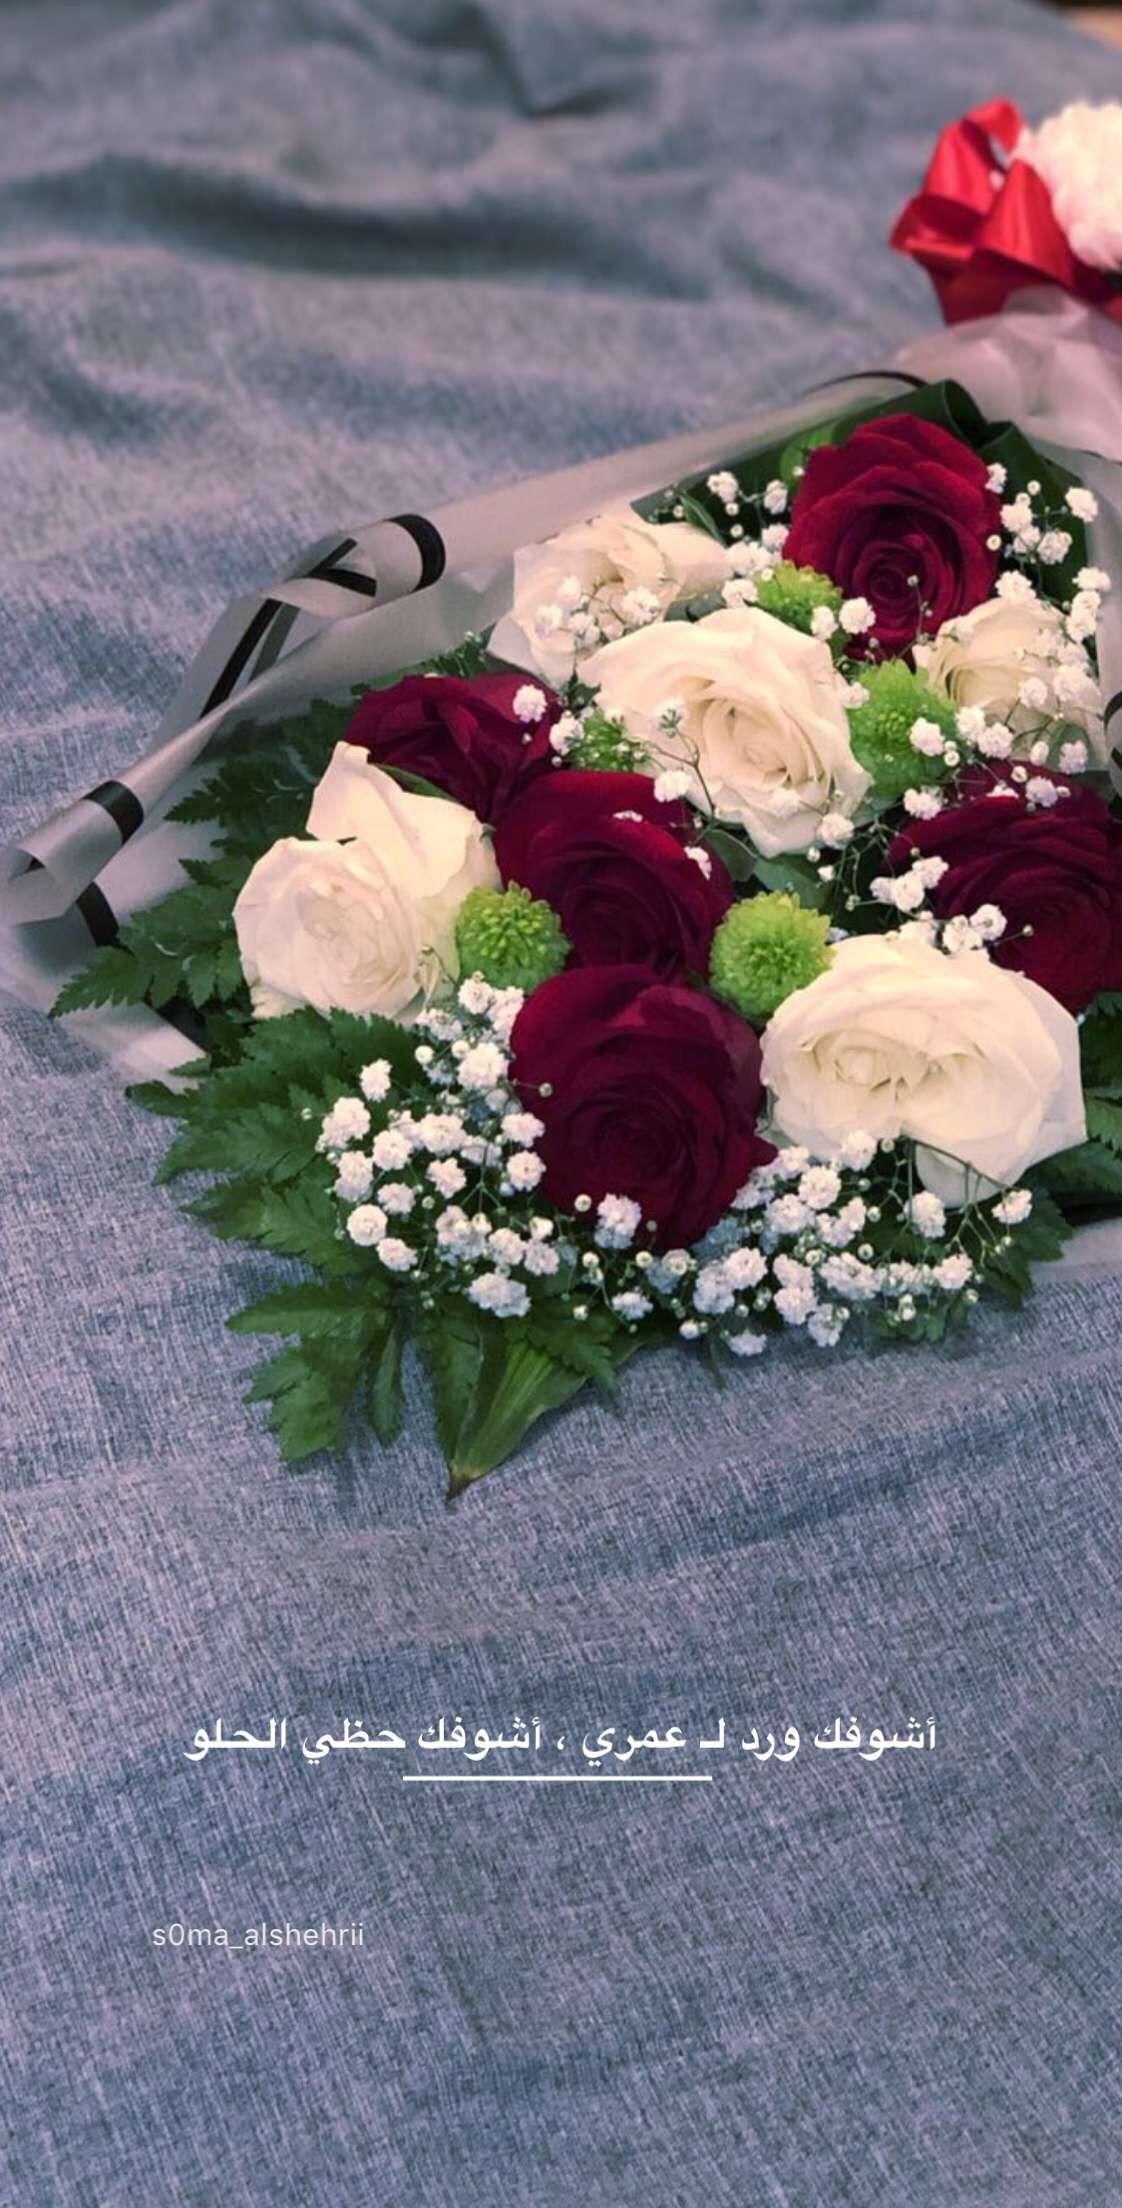 اشوفك ورد لـ عمري اشوفك حظي الحلو Table Decorations Decor Floral Wreath